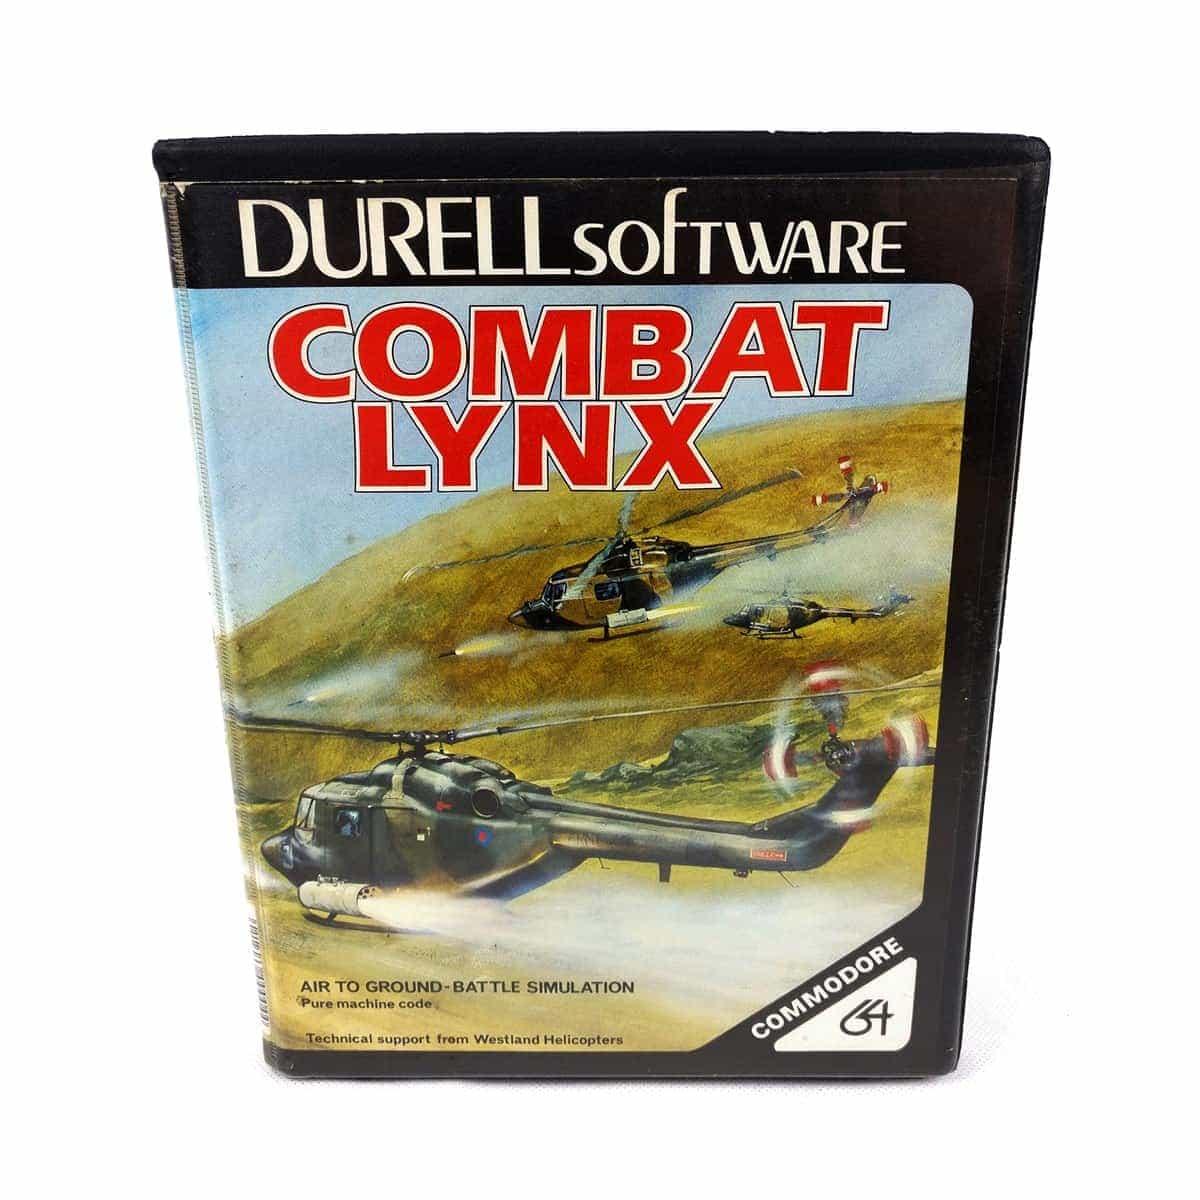 Combat Lynx (C64 Cassette)